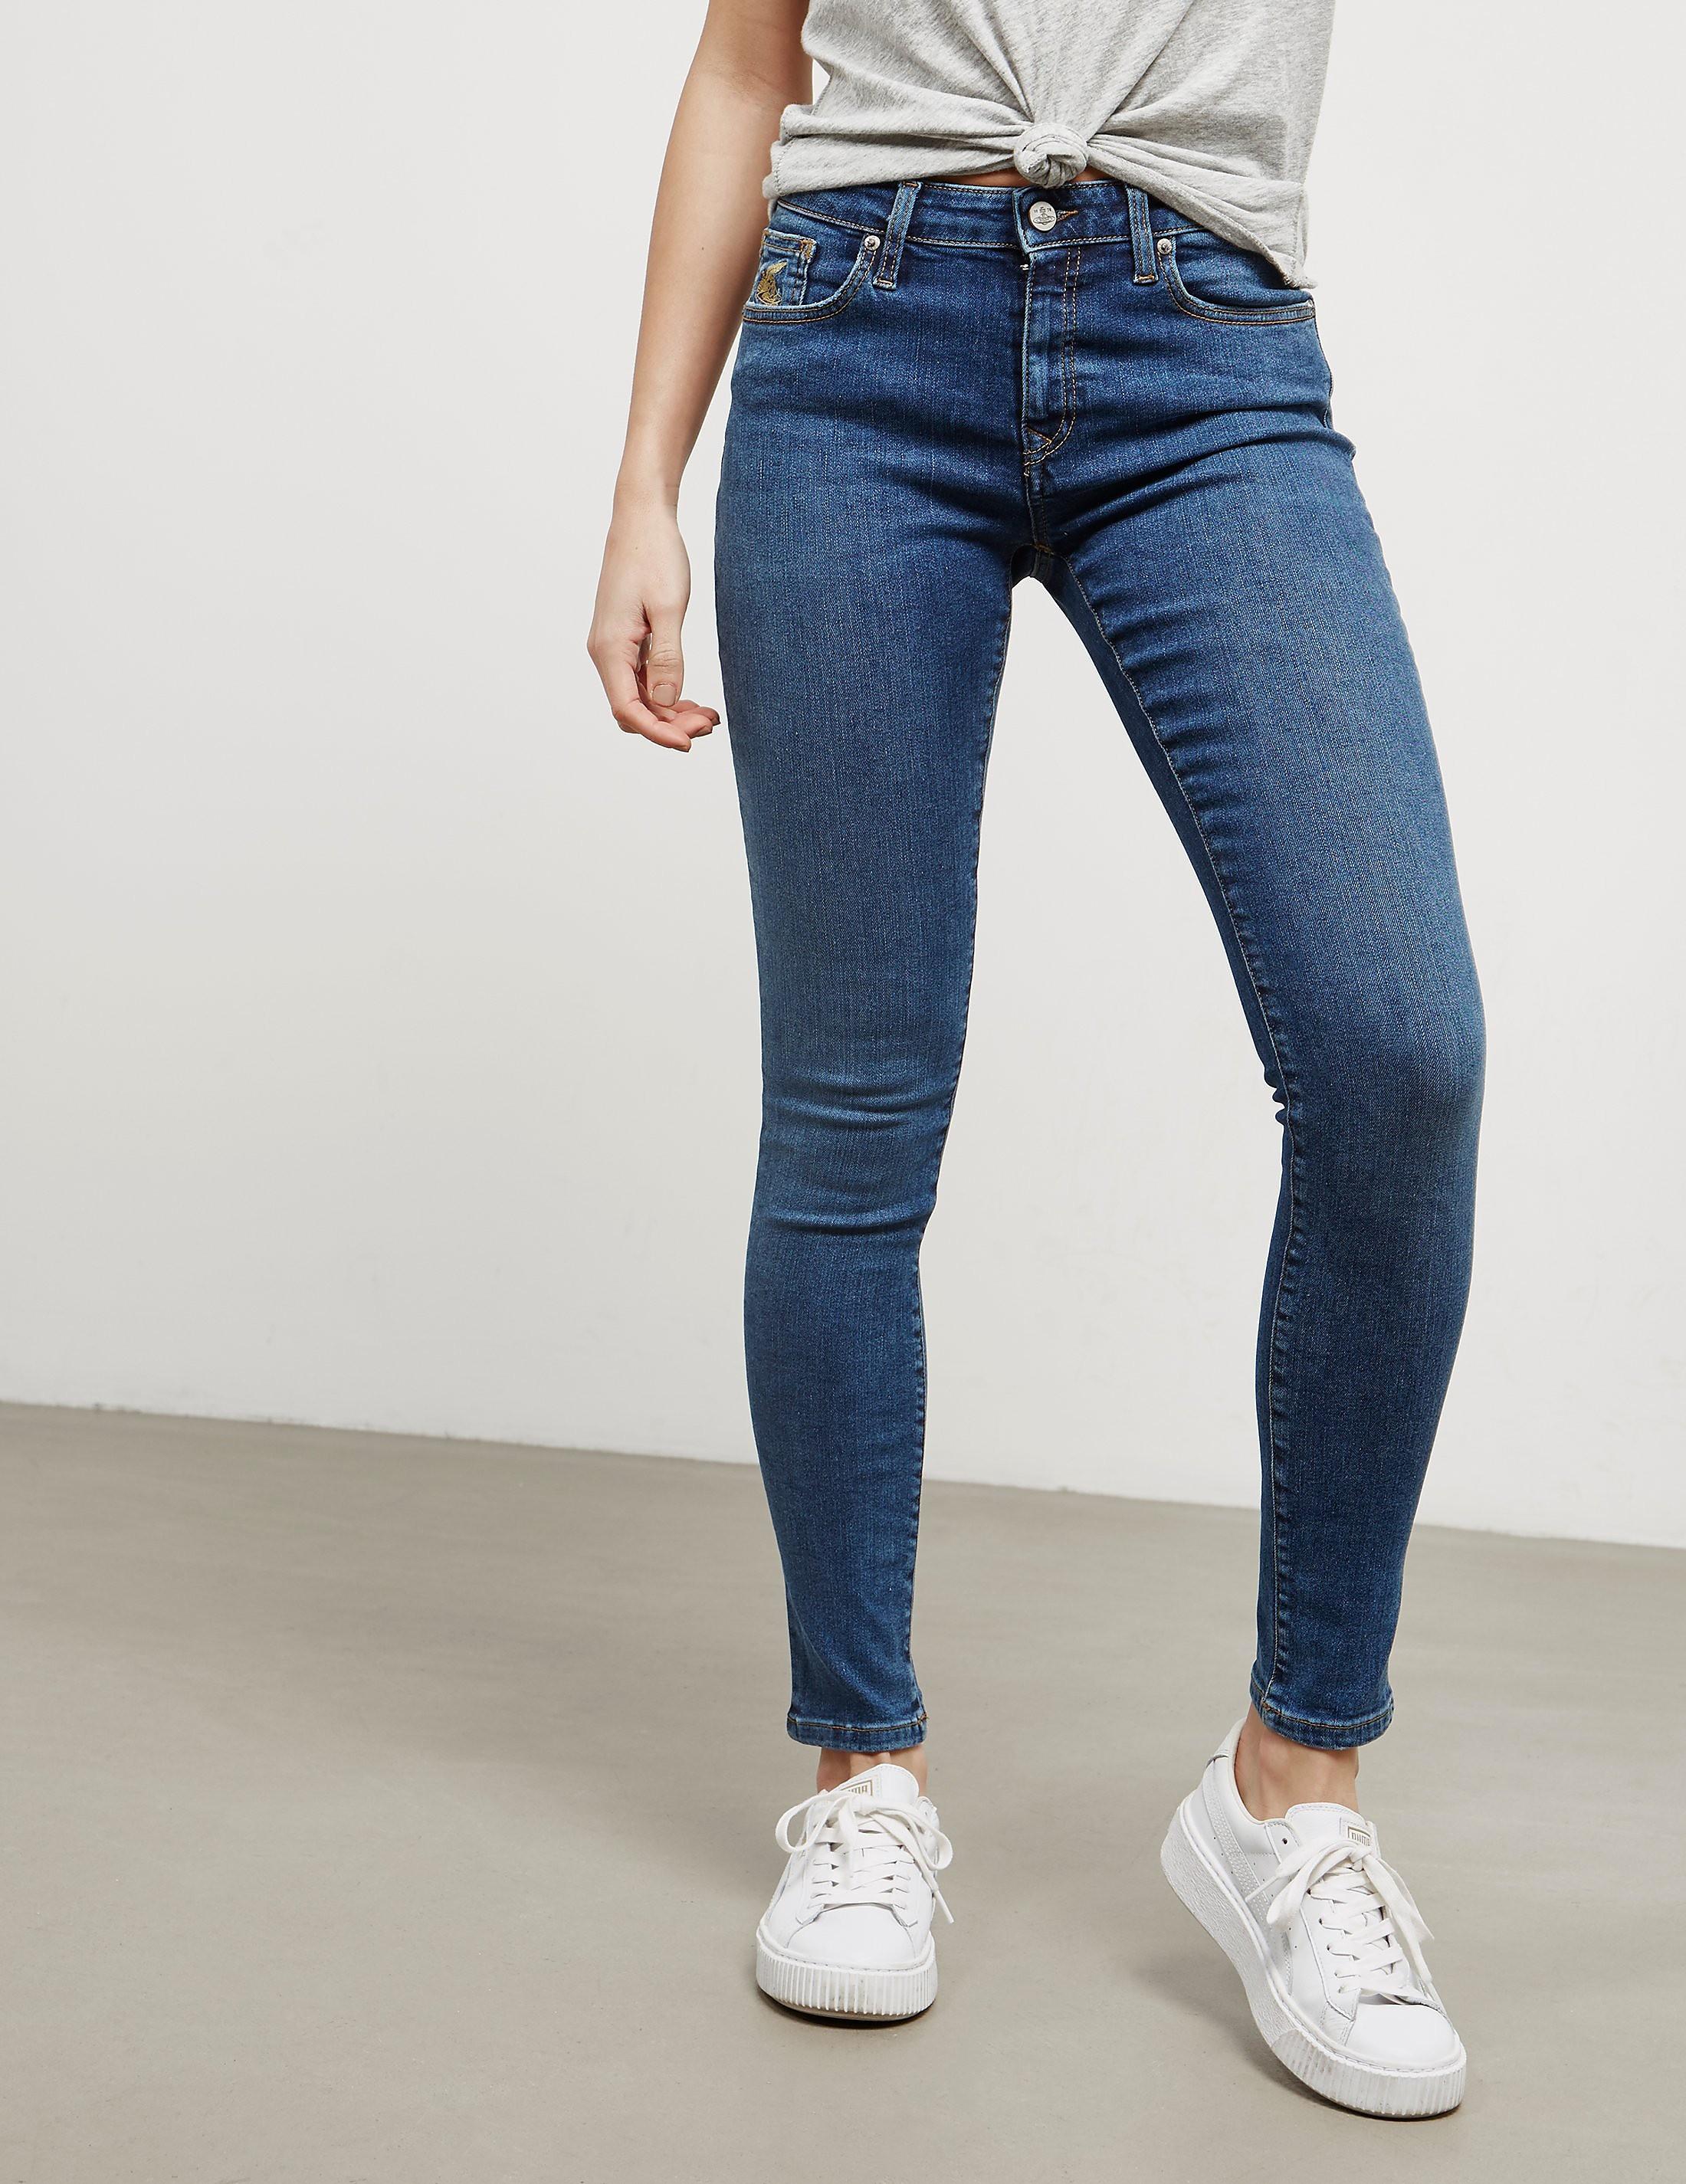 Vivienne Westwood Anglomania Skinny Jeans